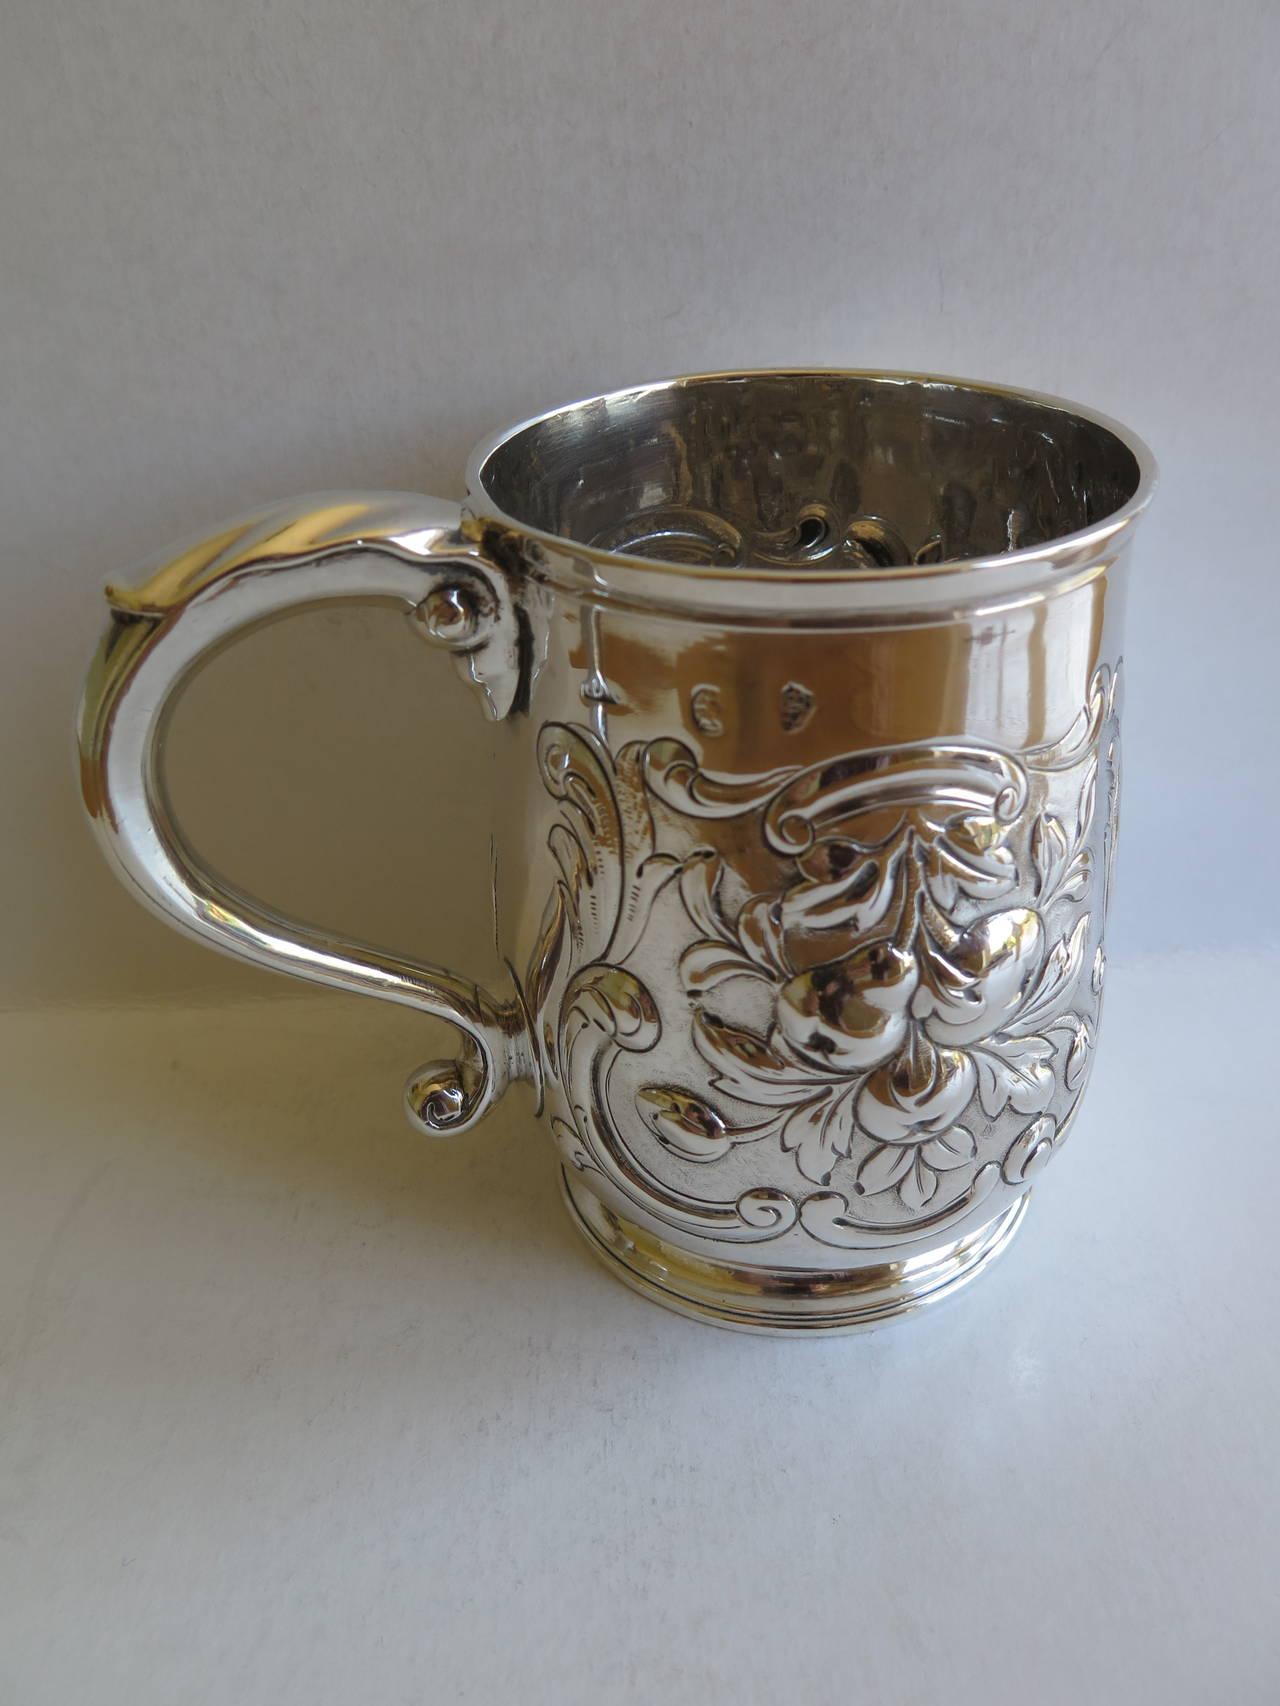 Rare Irish George II Silver Mug or Tankard by John Moore, Dublin 1740 7